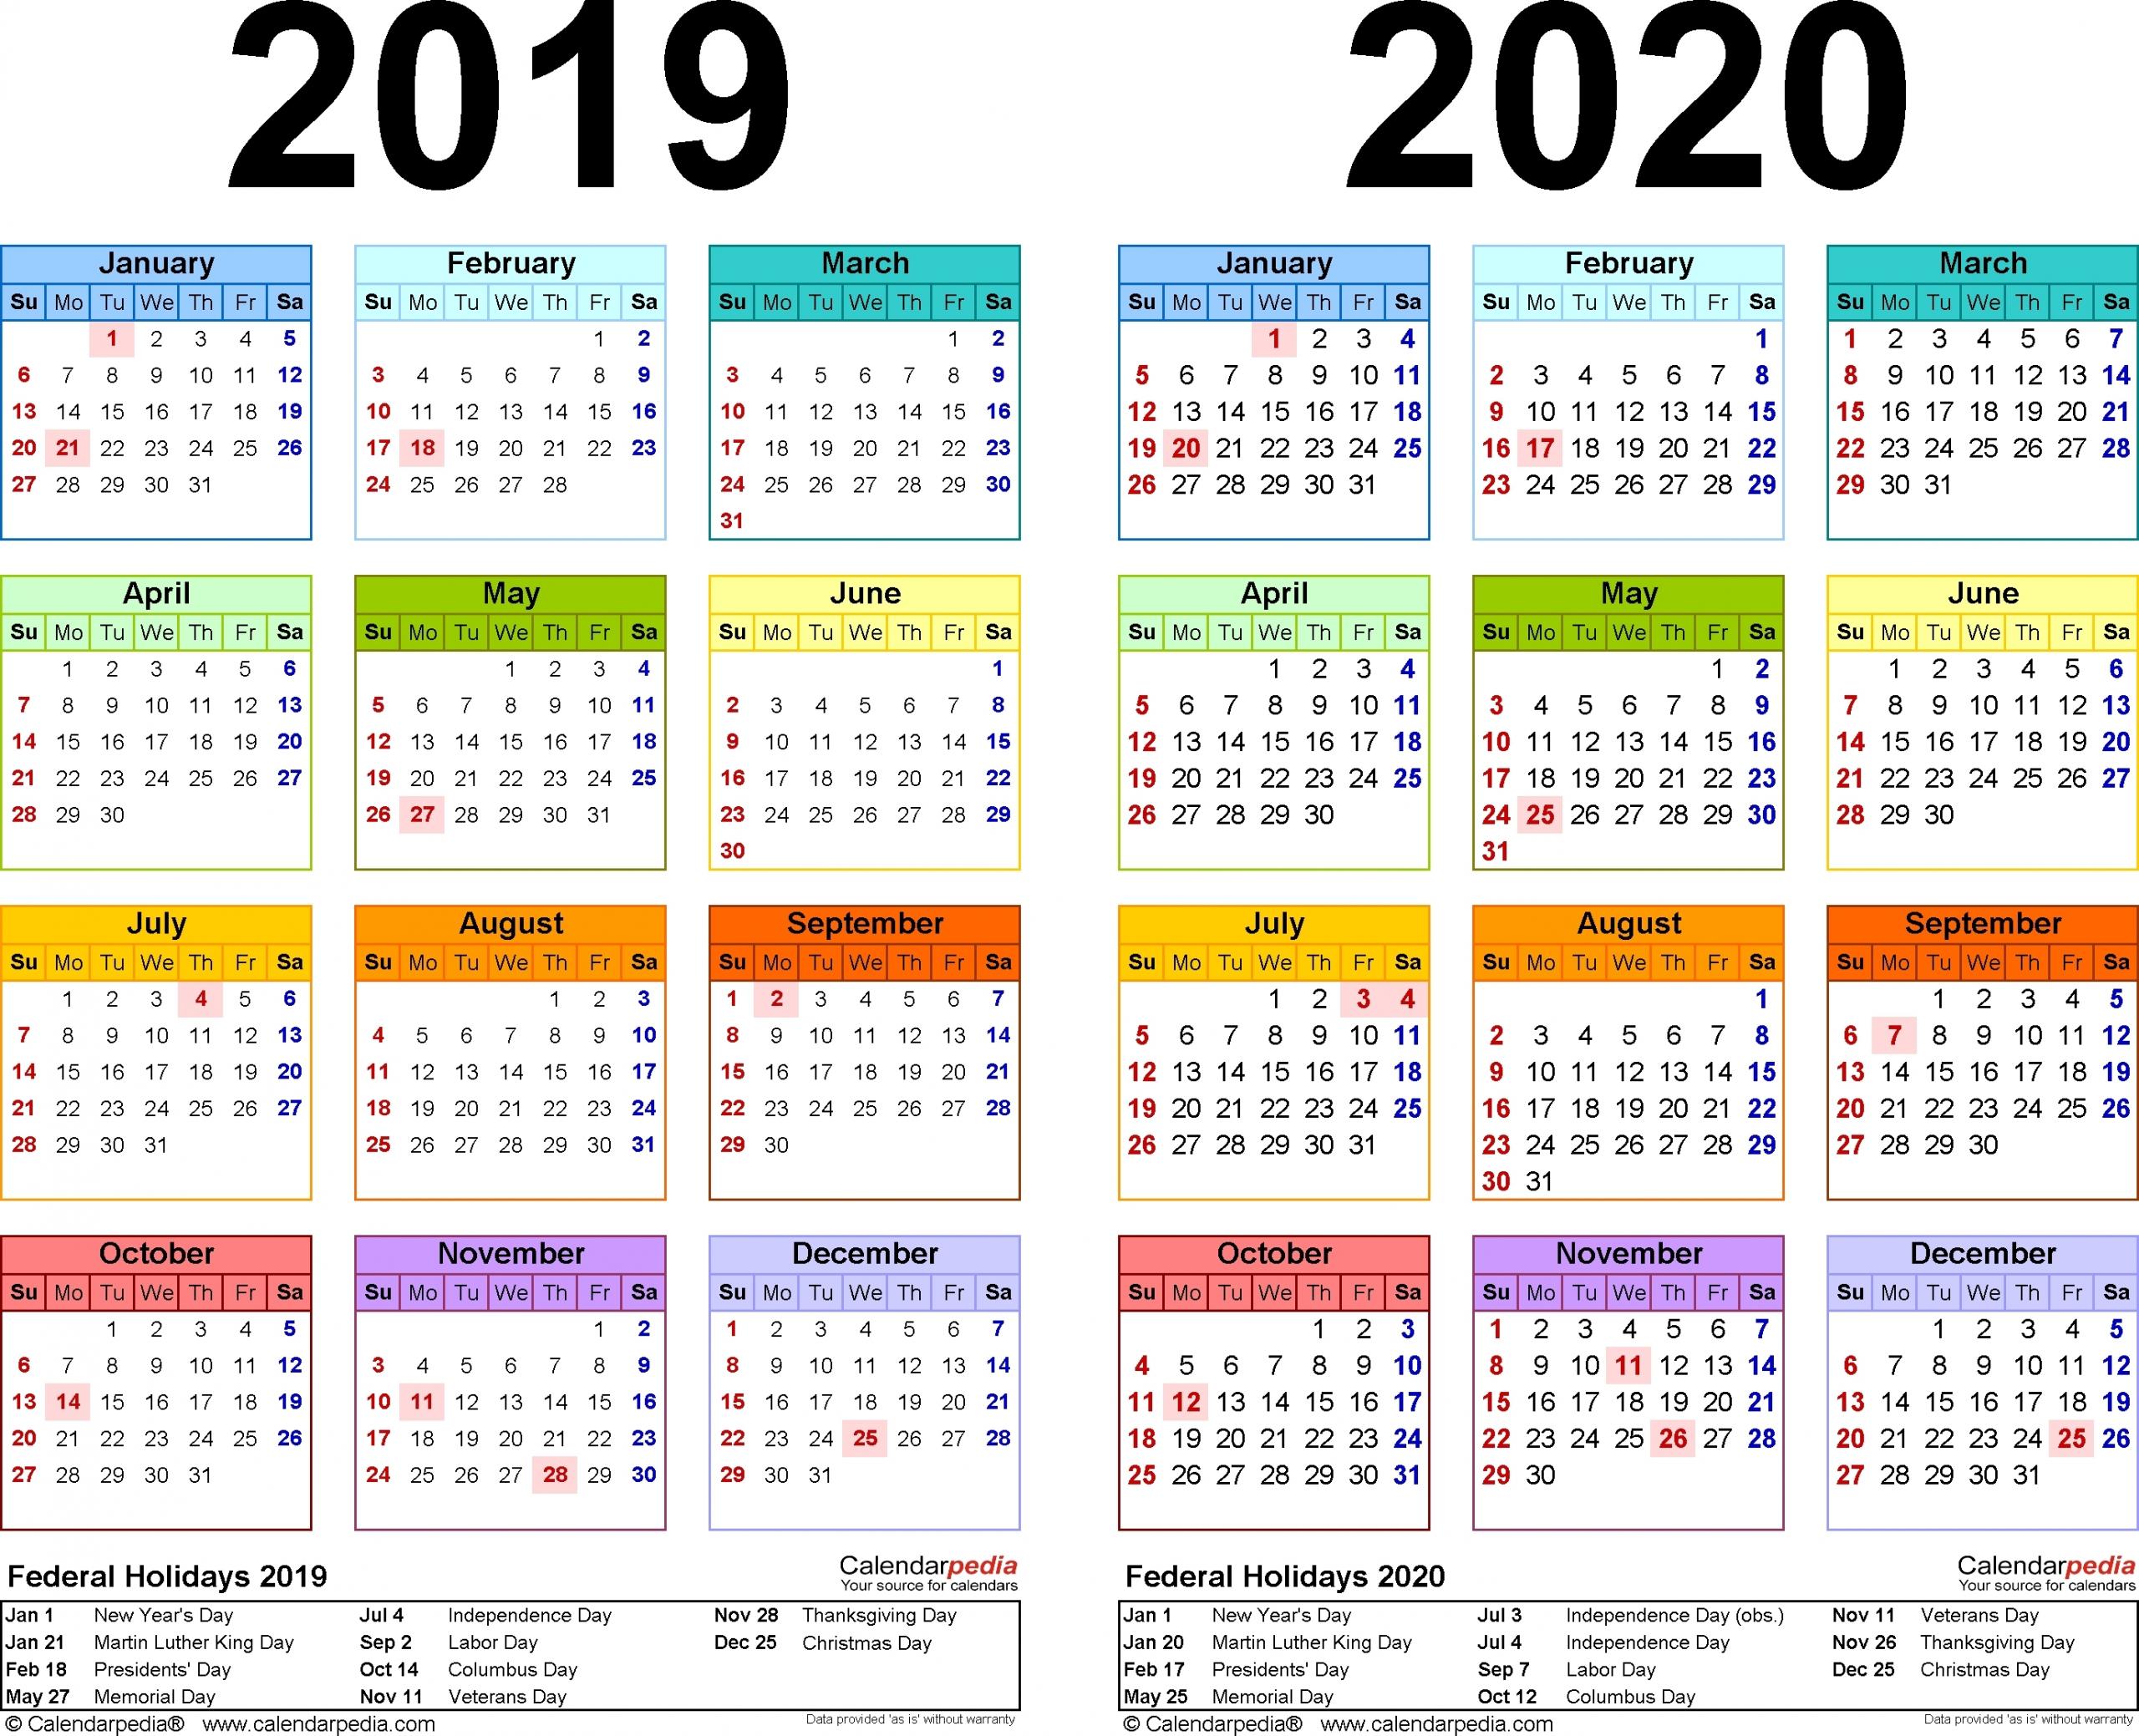 Perpetual Depo Provera Calculator  Depo Shot February 26Th Schedule